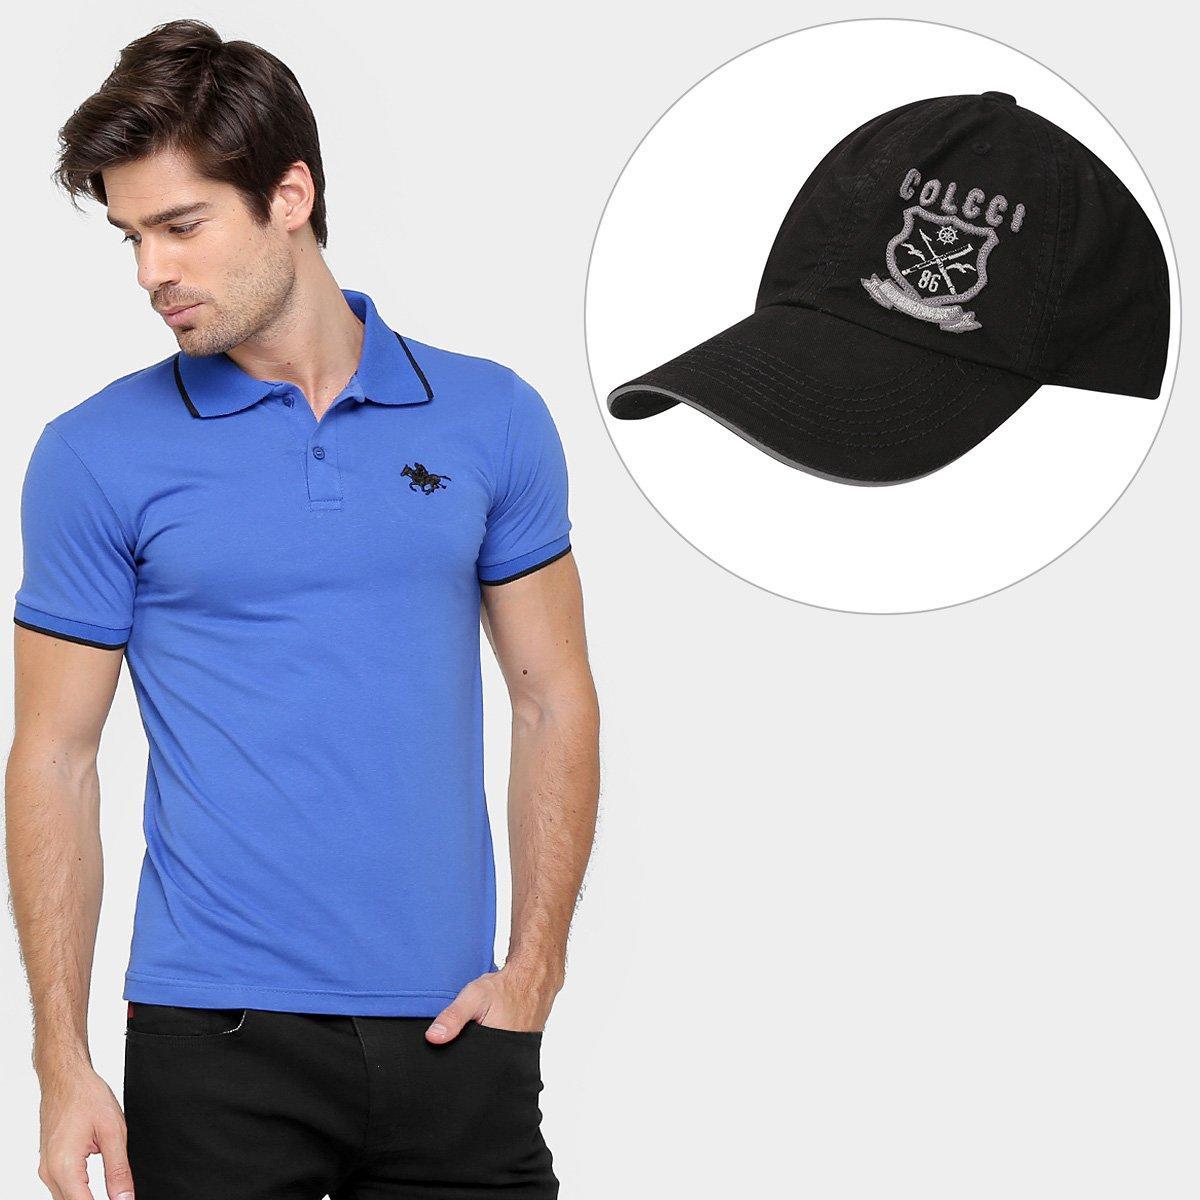 Kit Camisa Polo RG 518 Malha Friso Logo + Boné Colcci Aba Curva Brasão  Bordado ... b476b340dd1